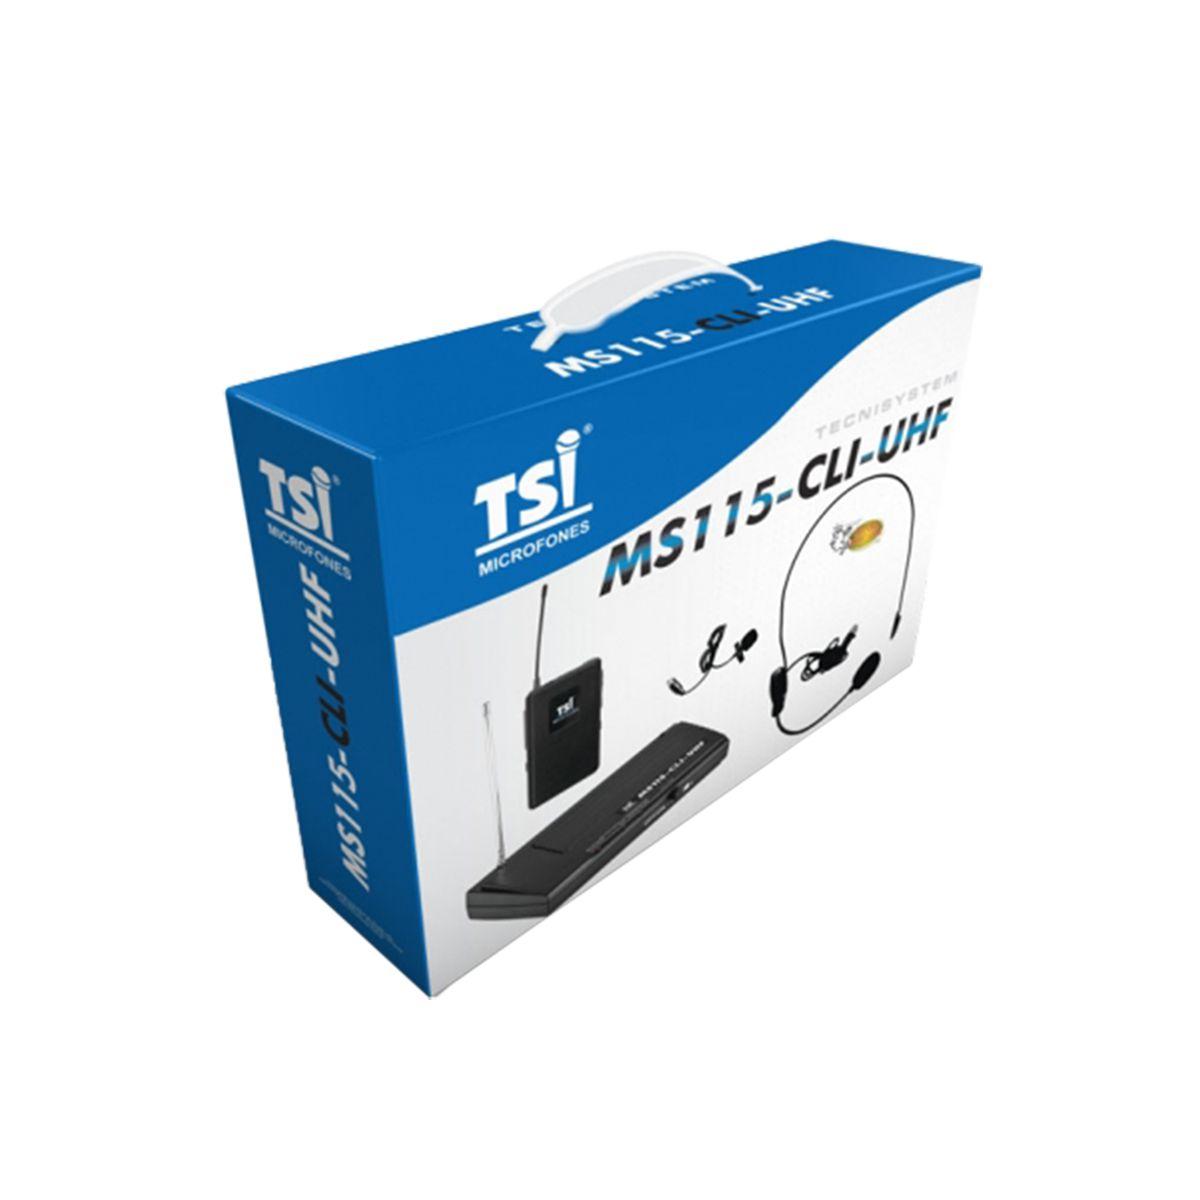 Microfone Sem Fio TSI MS115-CLI-UHF